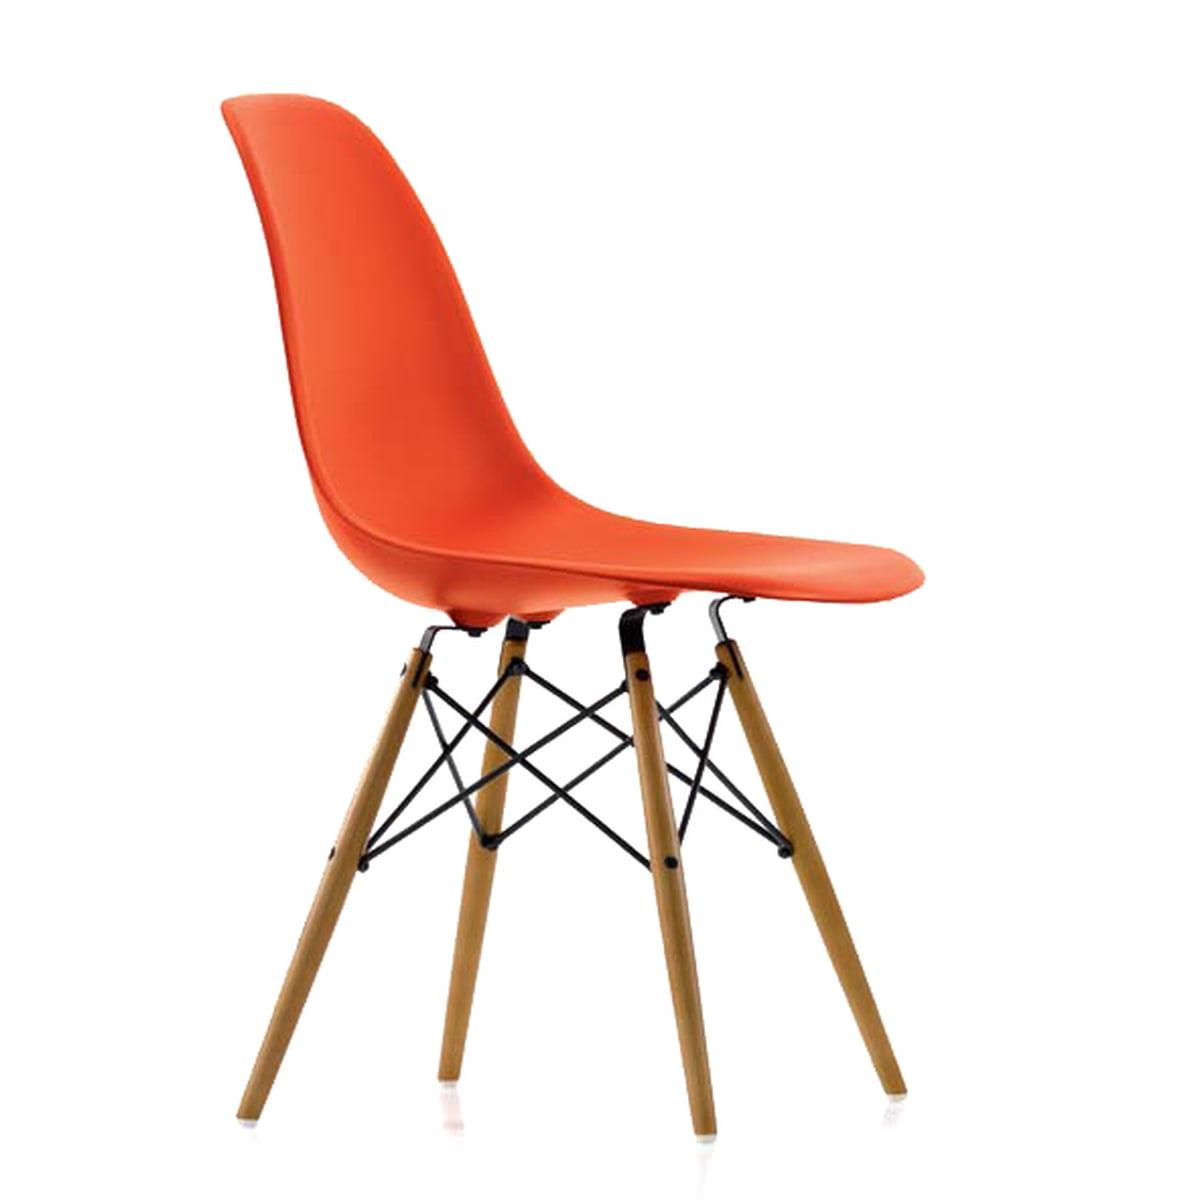 Vitra Eames Plastic Side Chair Dsw H 43 Cm Ahorn Gelblich